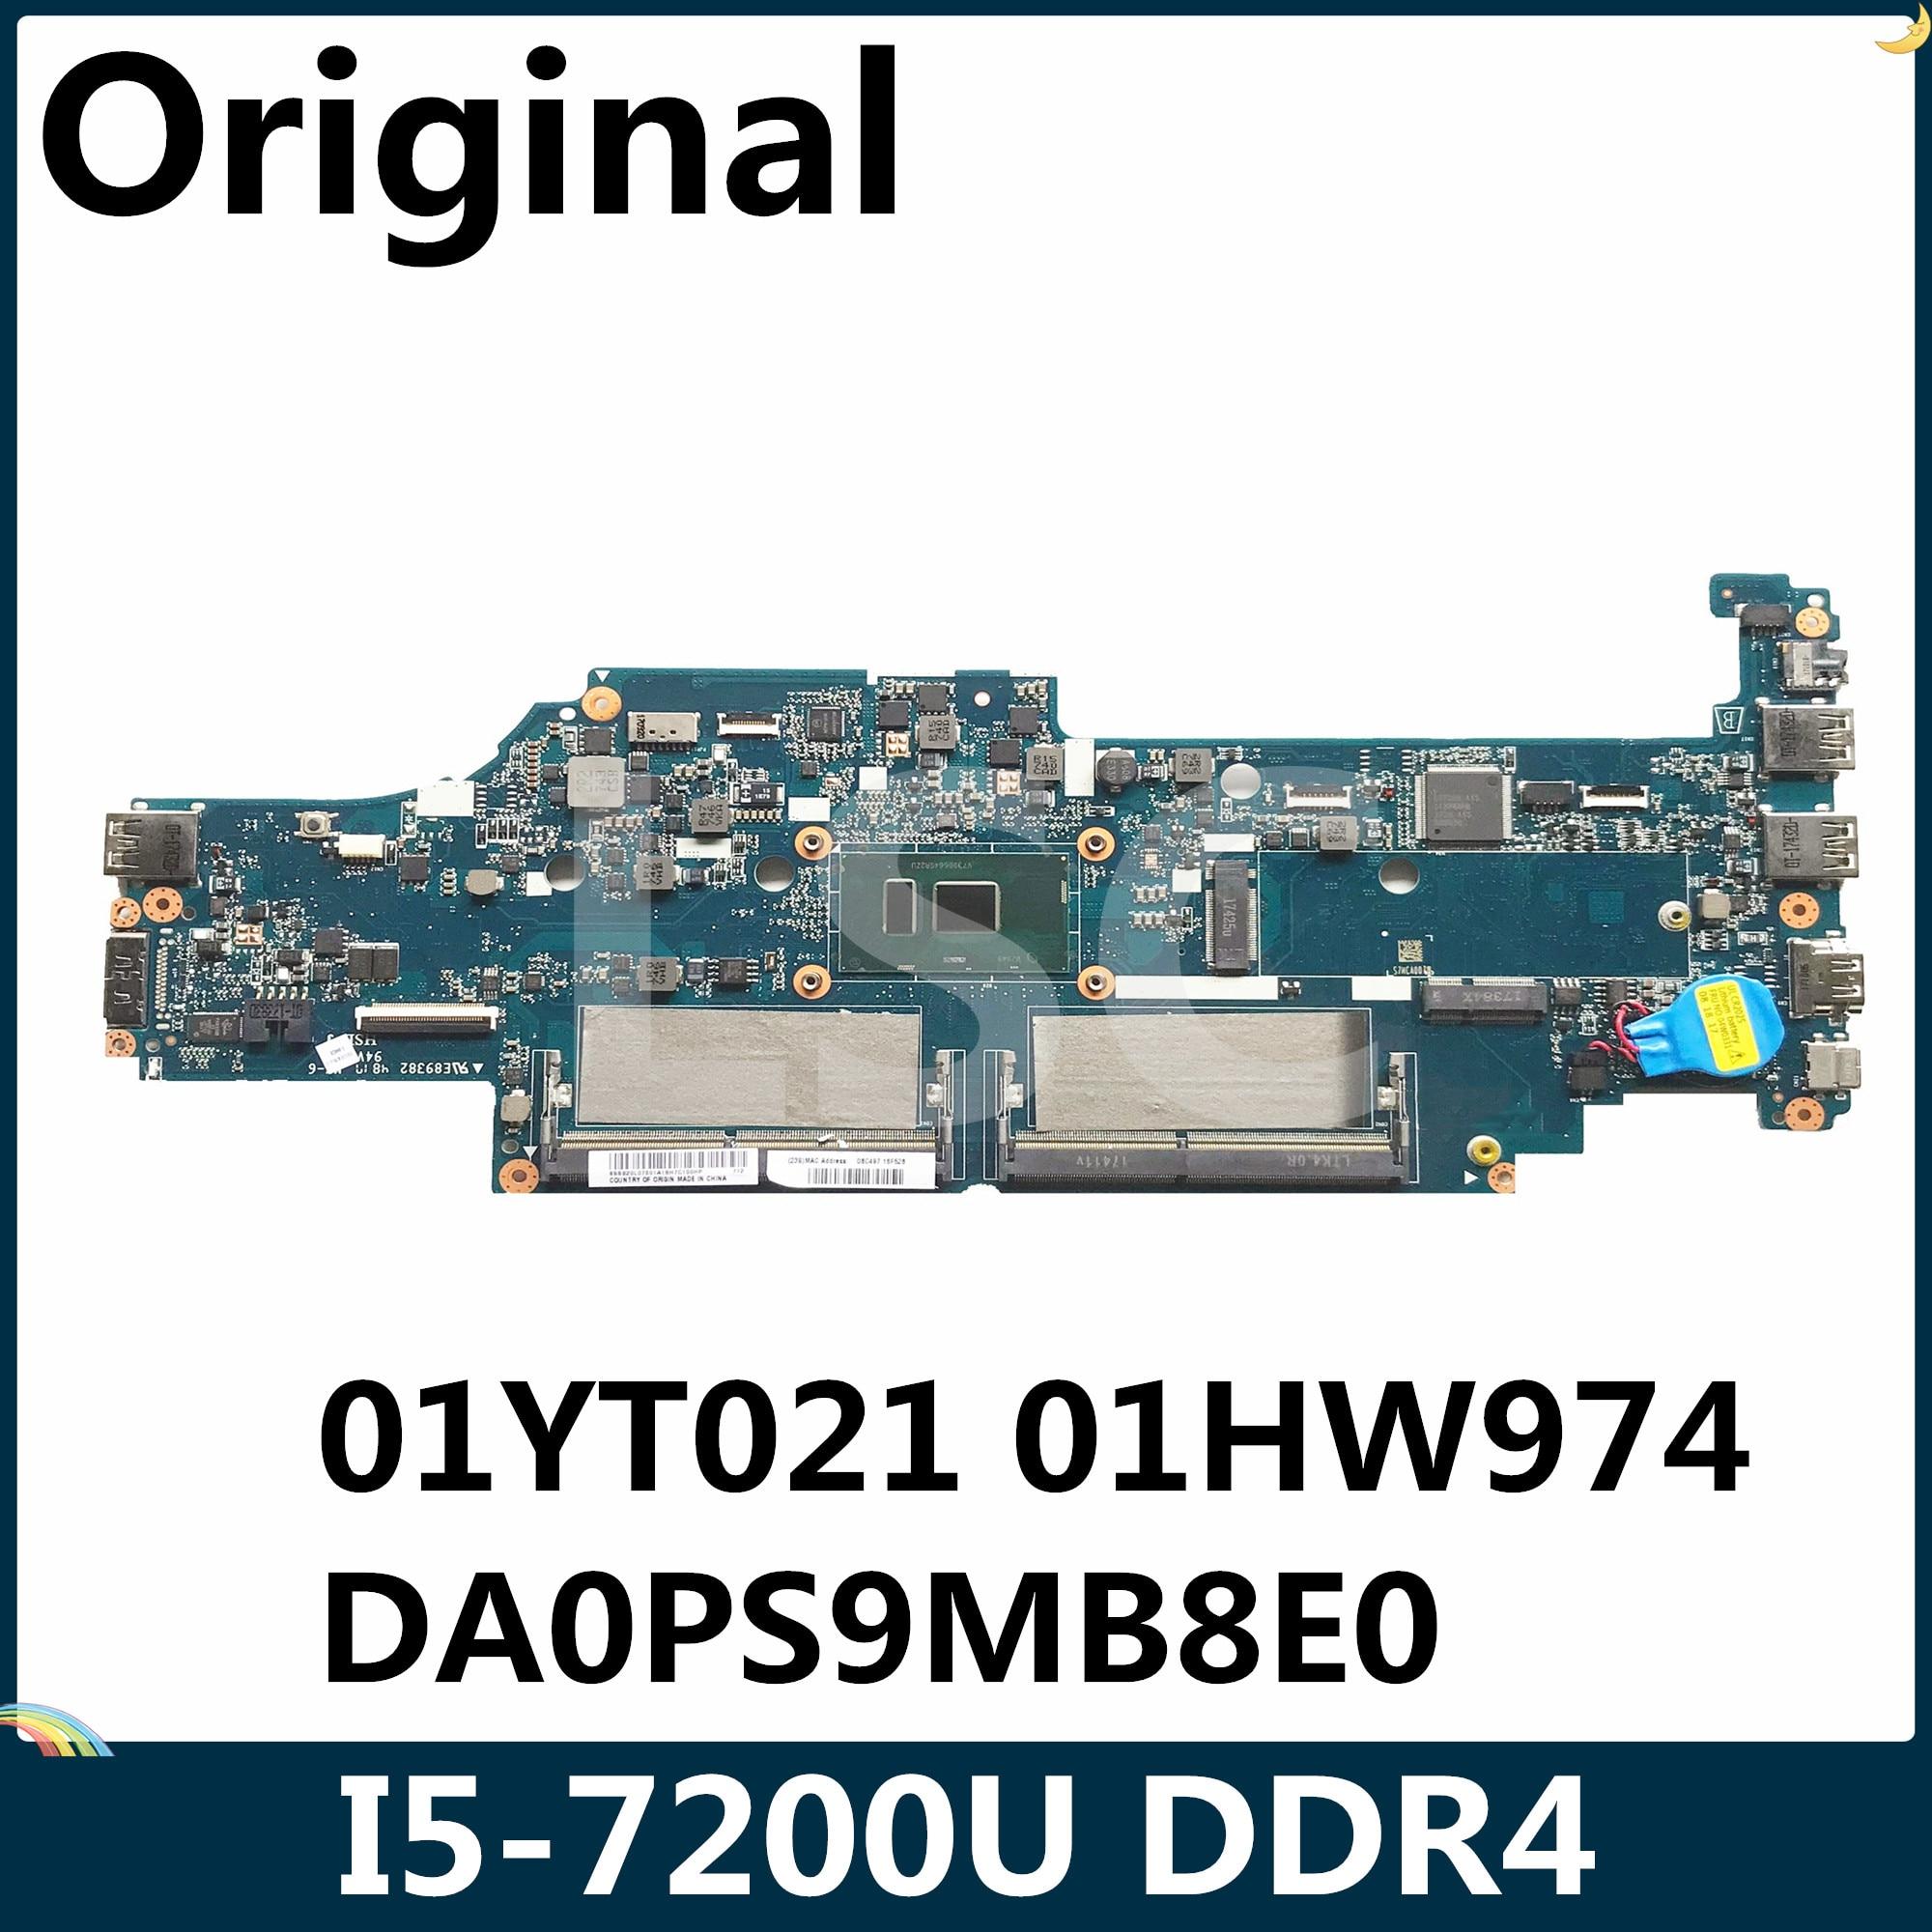 LSC For LENOVO Thinkpad Yoga 13 S2 Laptop motherboard Core SR342 I5-7200U DA0PS9MB8E0 01YT021 01HW974 DDR4